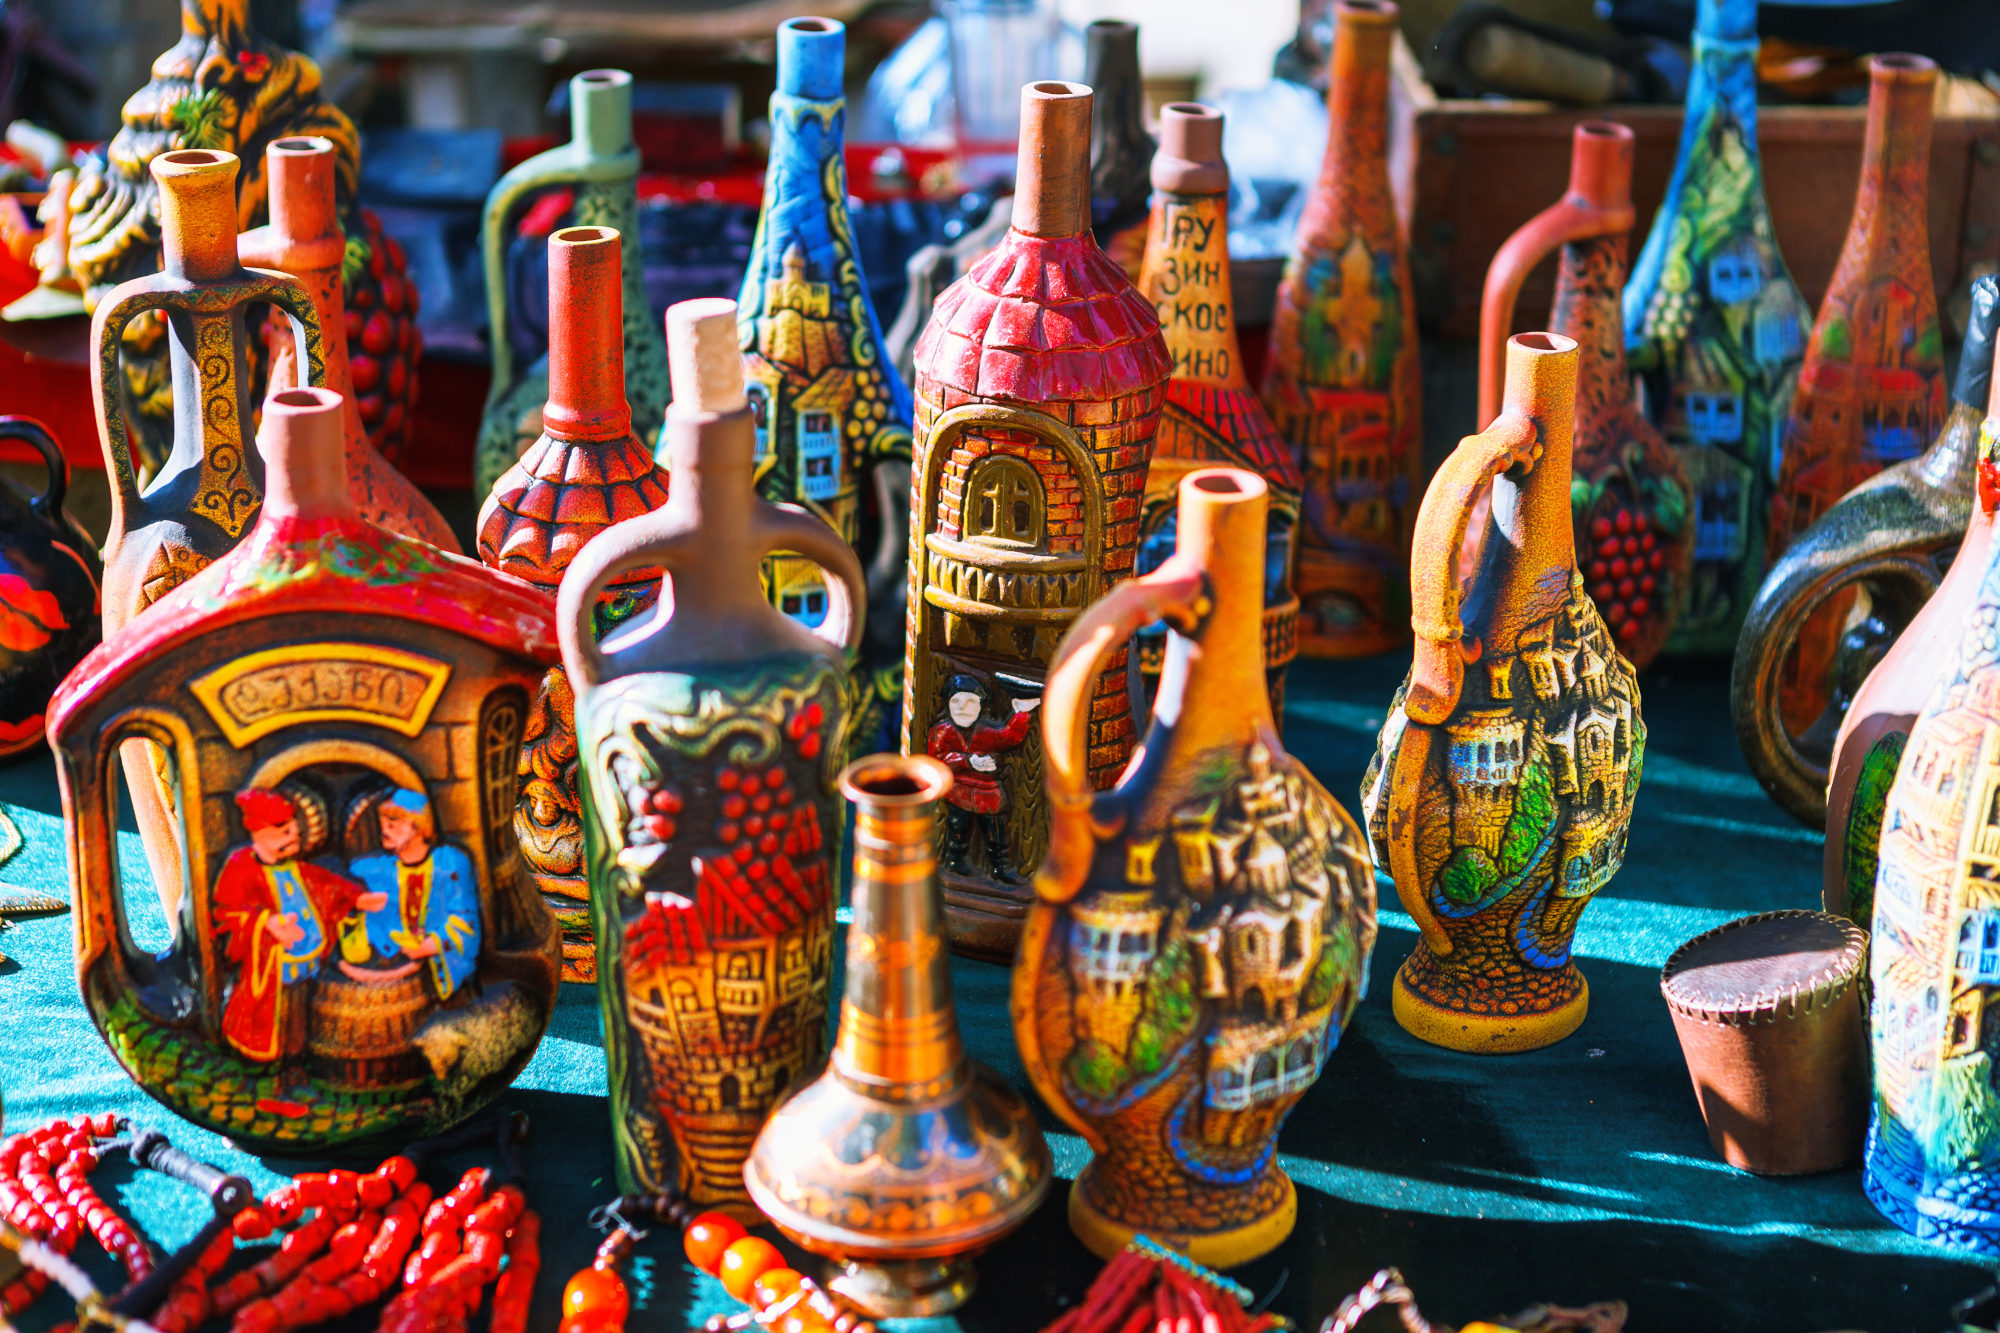 Colourful flea market in Tbilisi